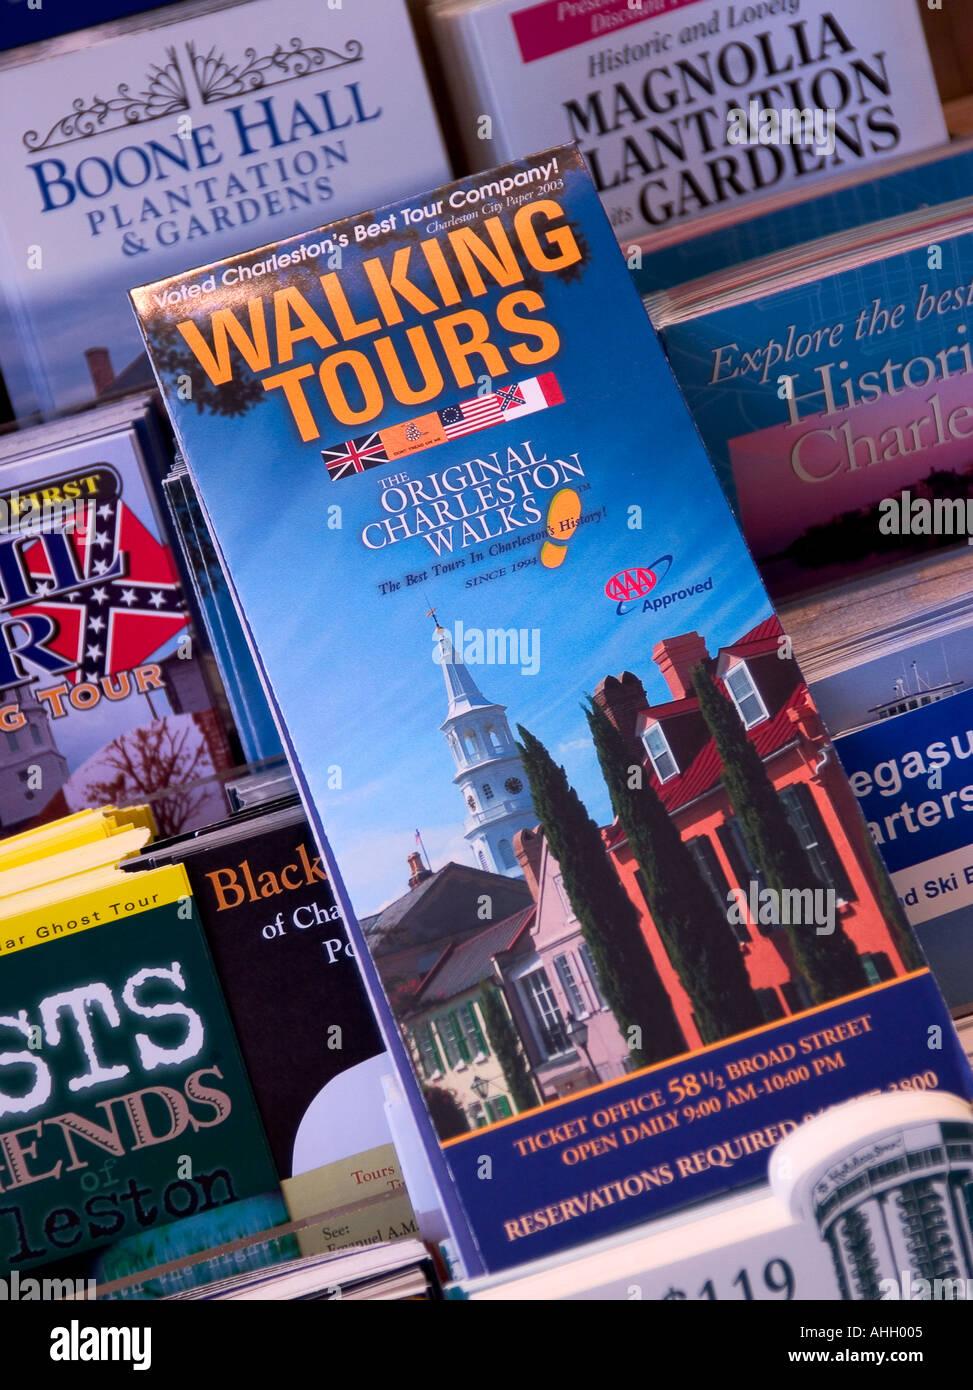 Walking Tours Brochure Charleston South Carolina USA - Stock Image